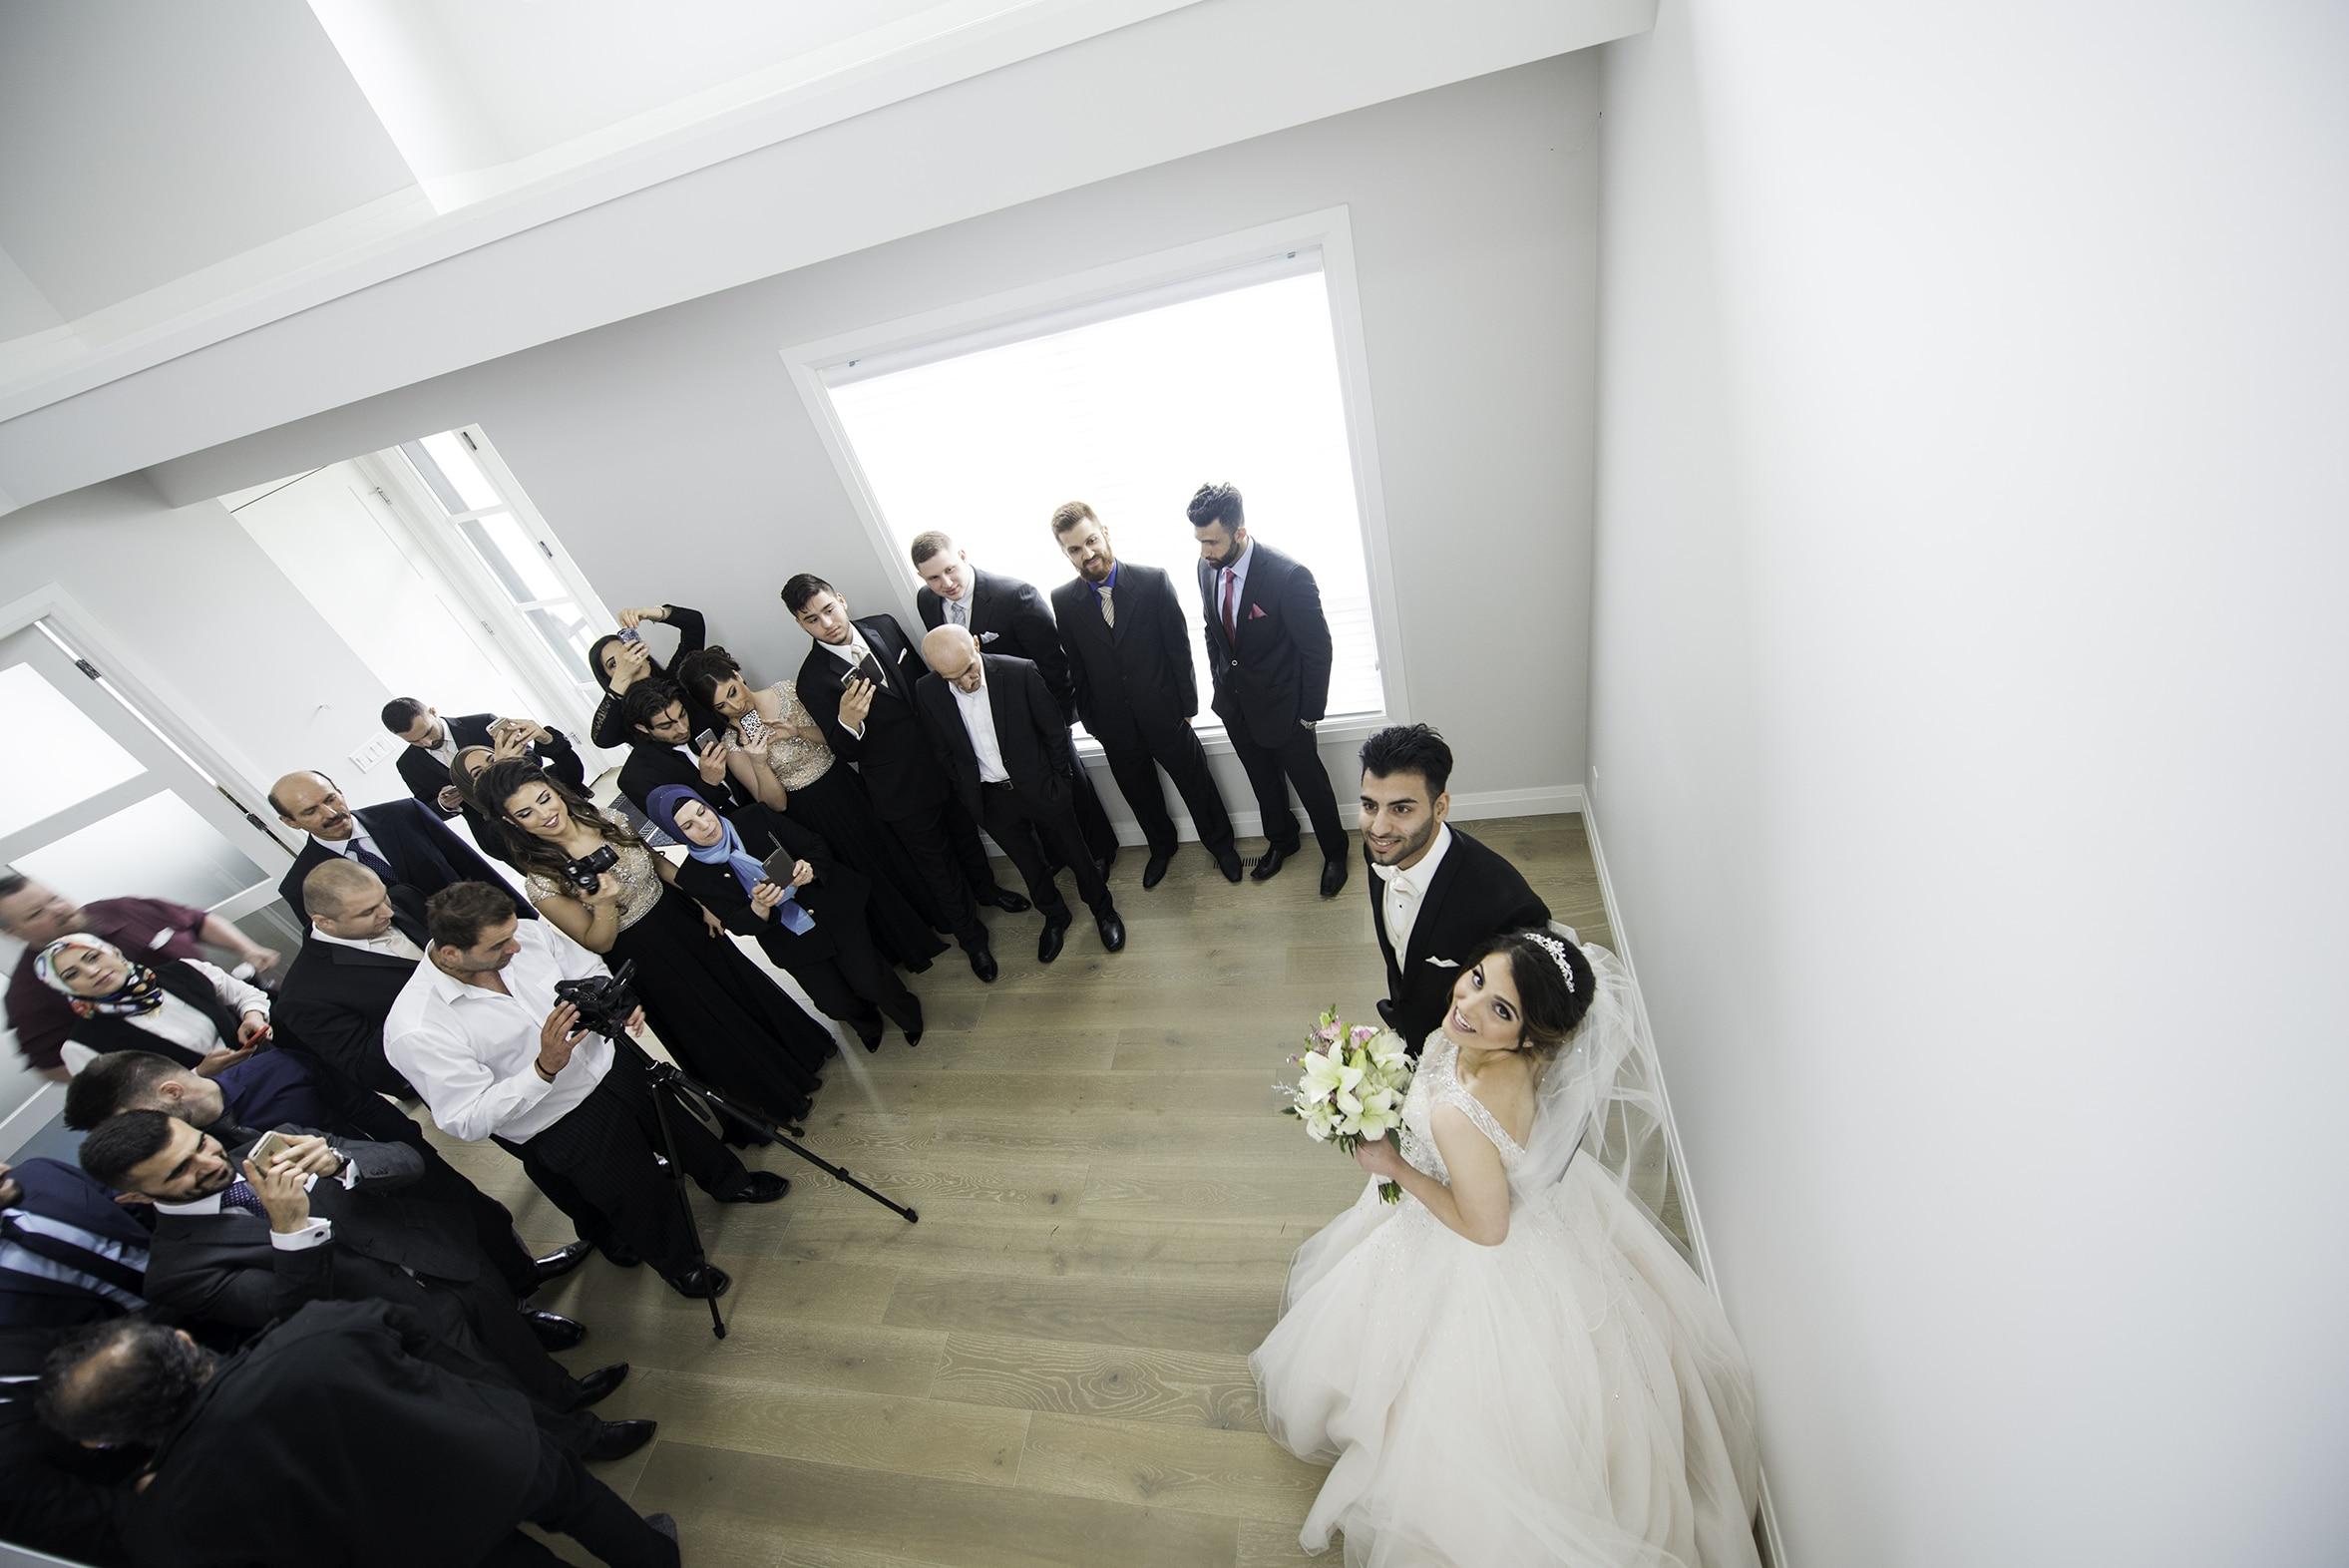 turkish wedding ceremony